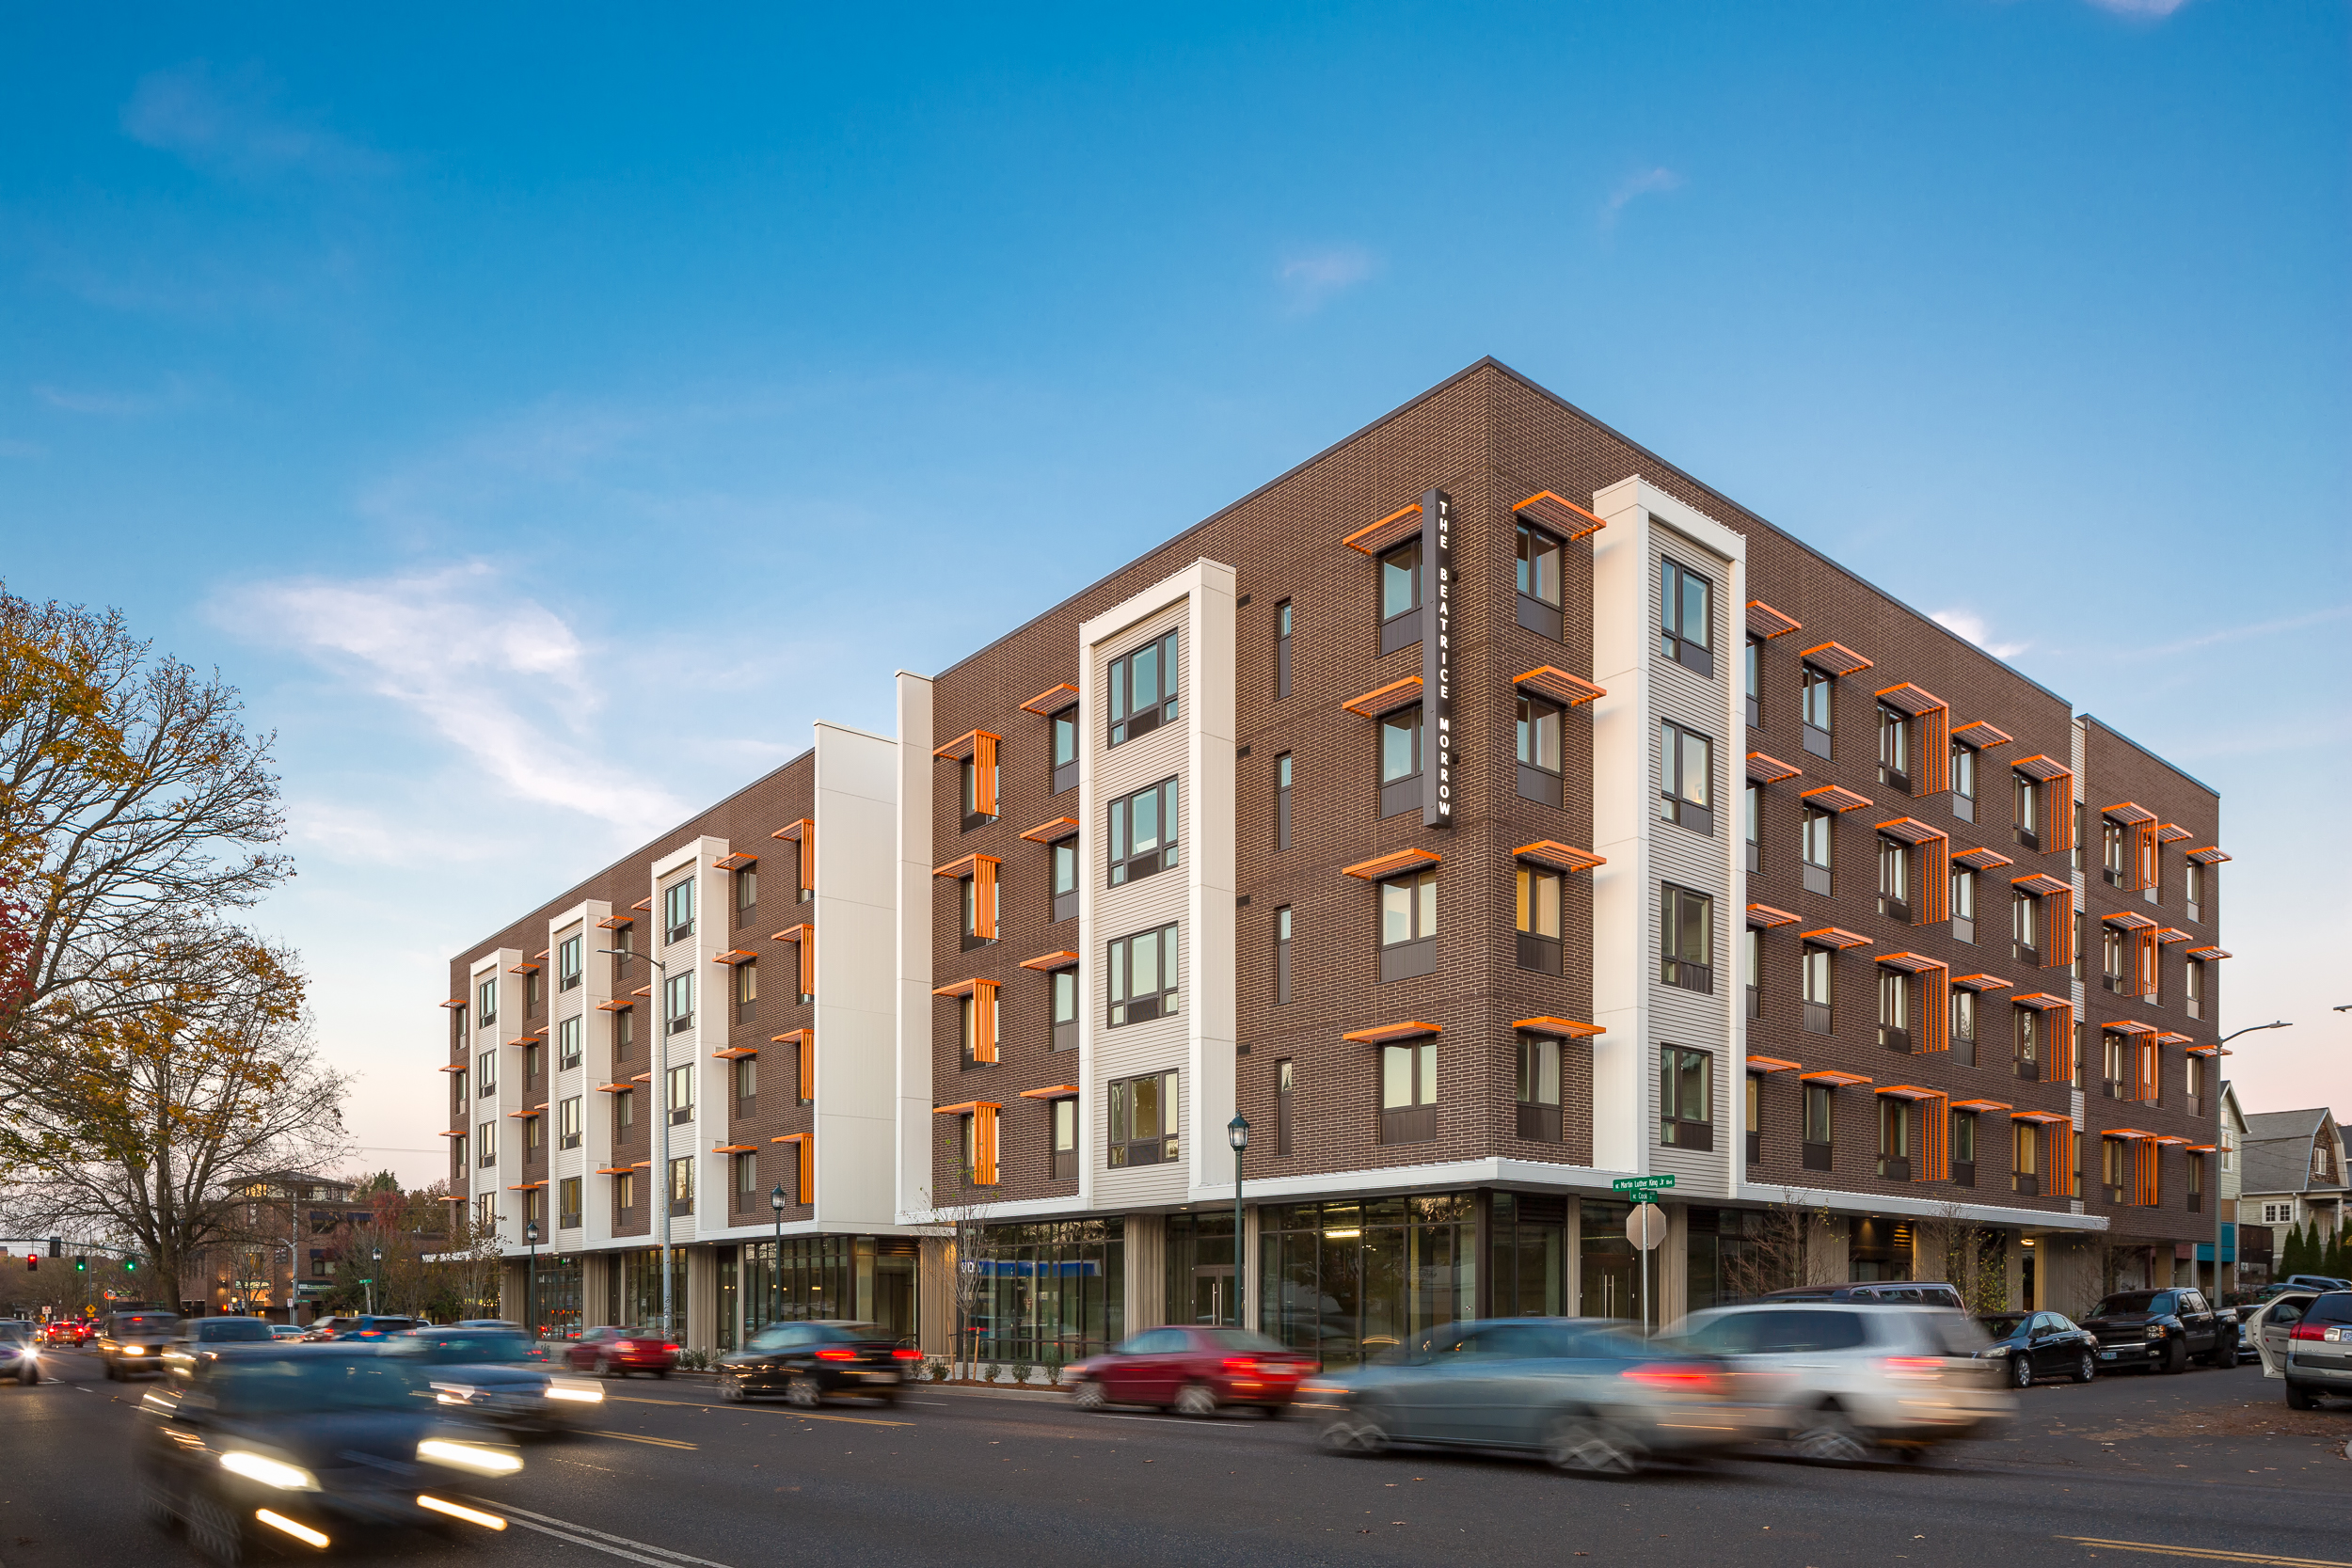 Beatrice Morrow / Carleton Hart Architecture